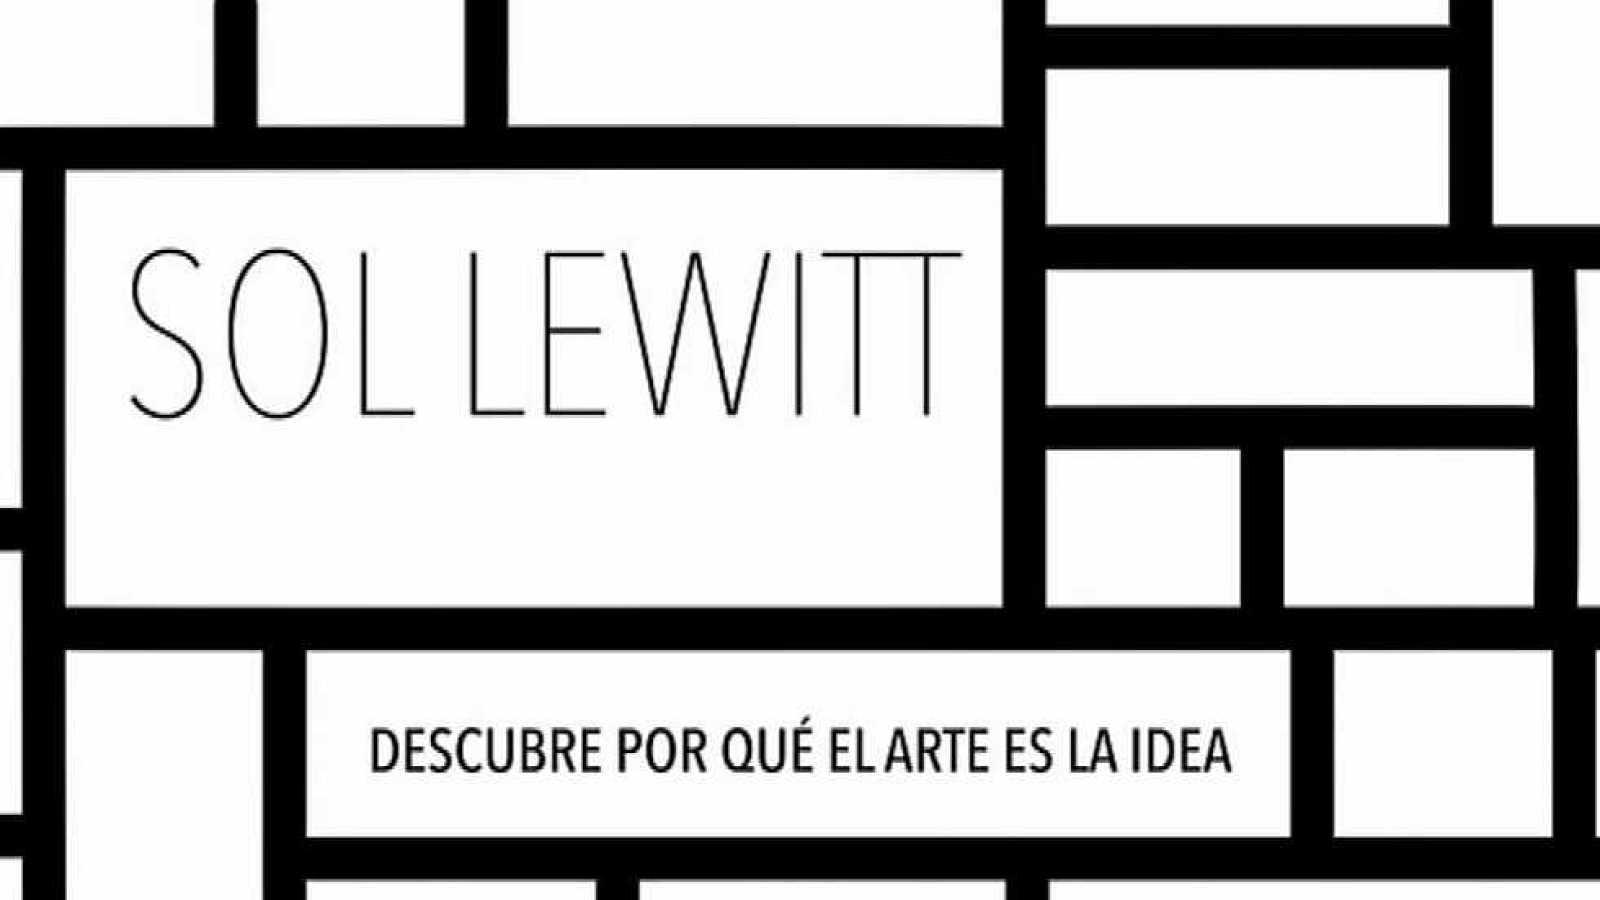 La aventura del saber - 26/10/15 - RTVE.es